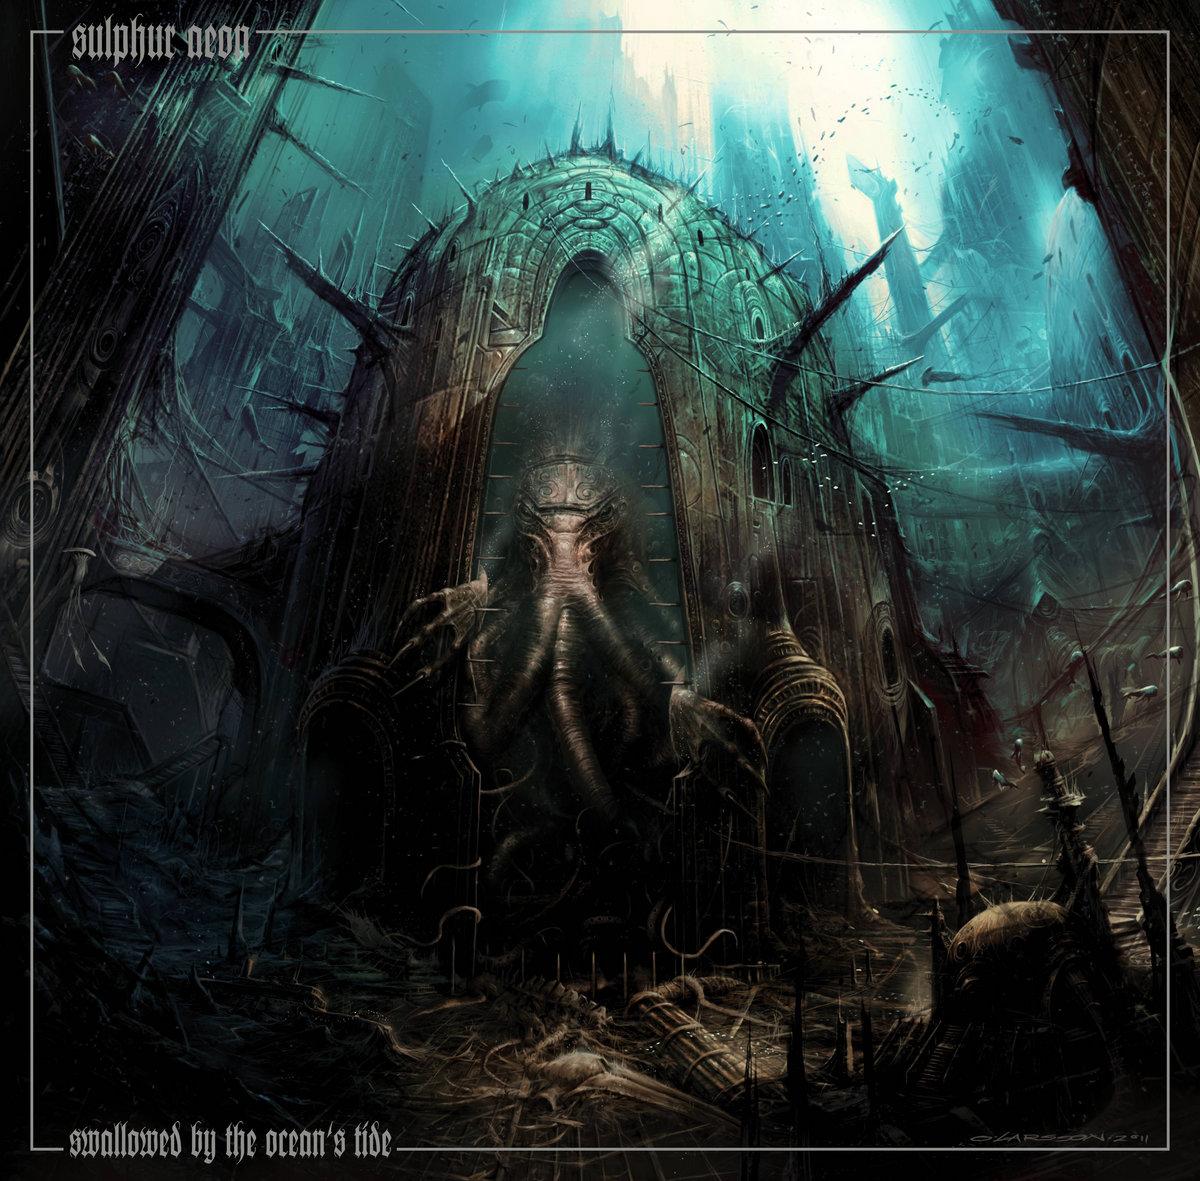 SULPHUR AEON - Swallowed By The Ocean's Tide (Album, 2013)